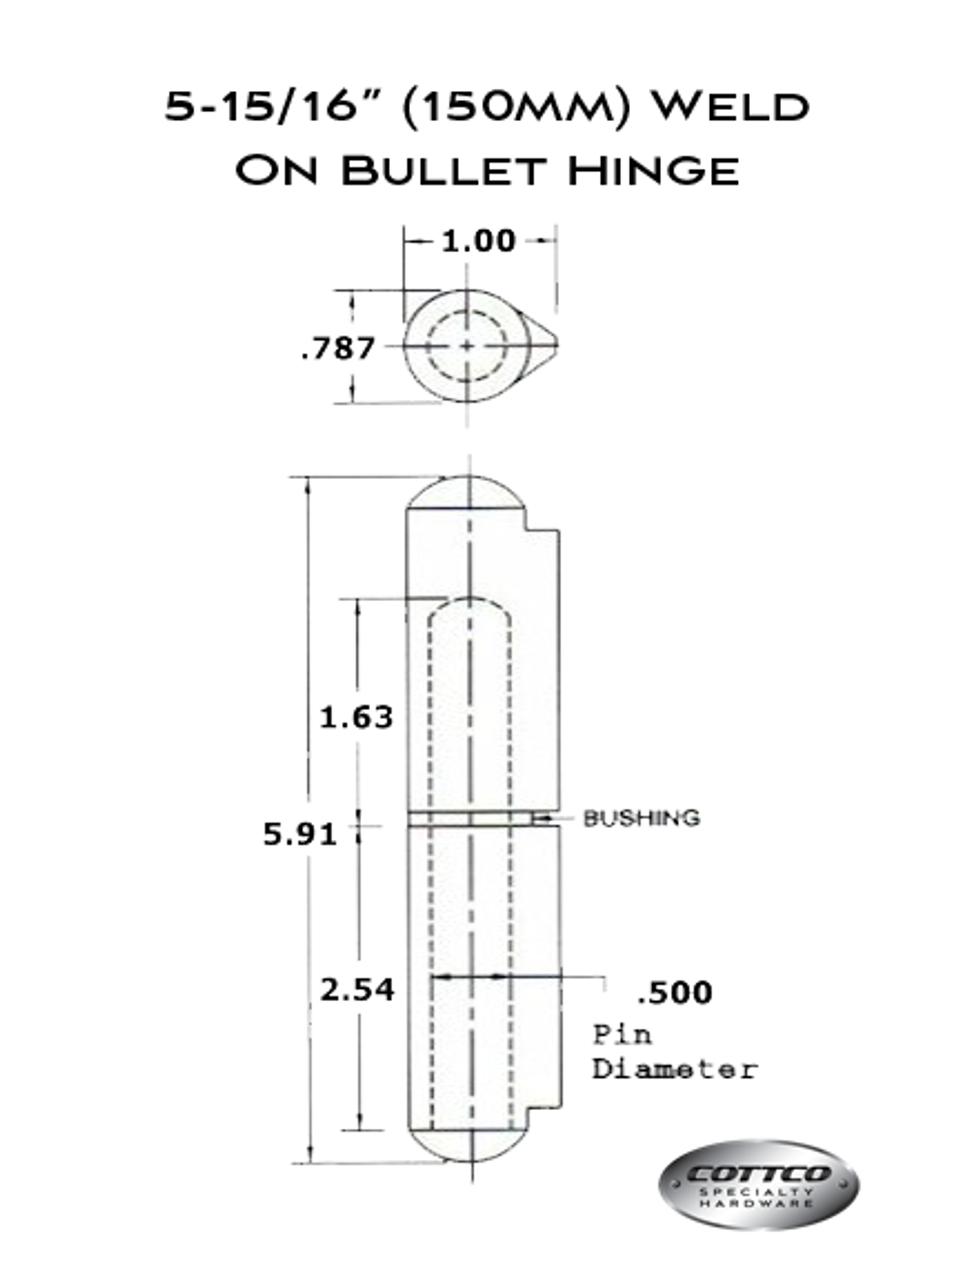 FSP-150-G/F Weld On Bullet Hinge Schematic